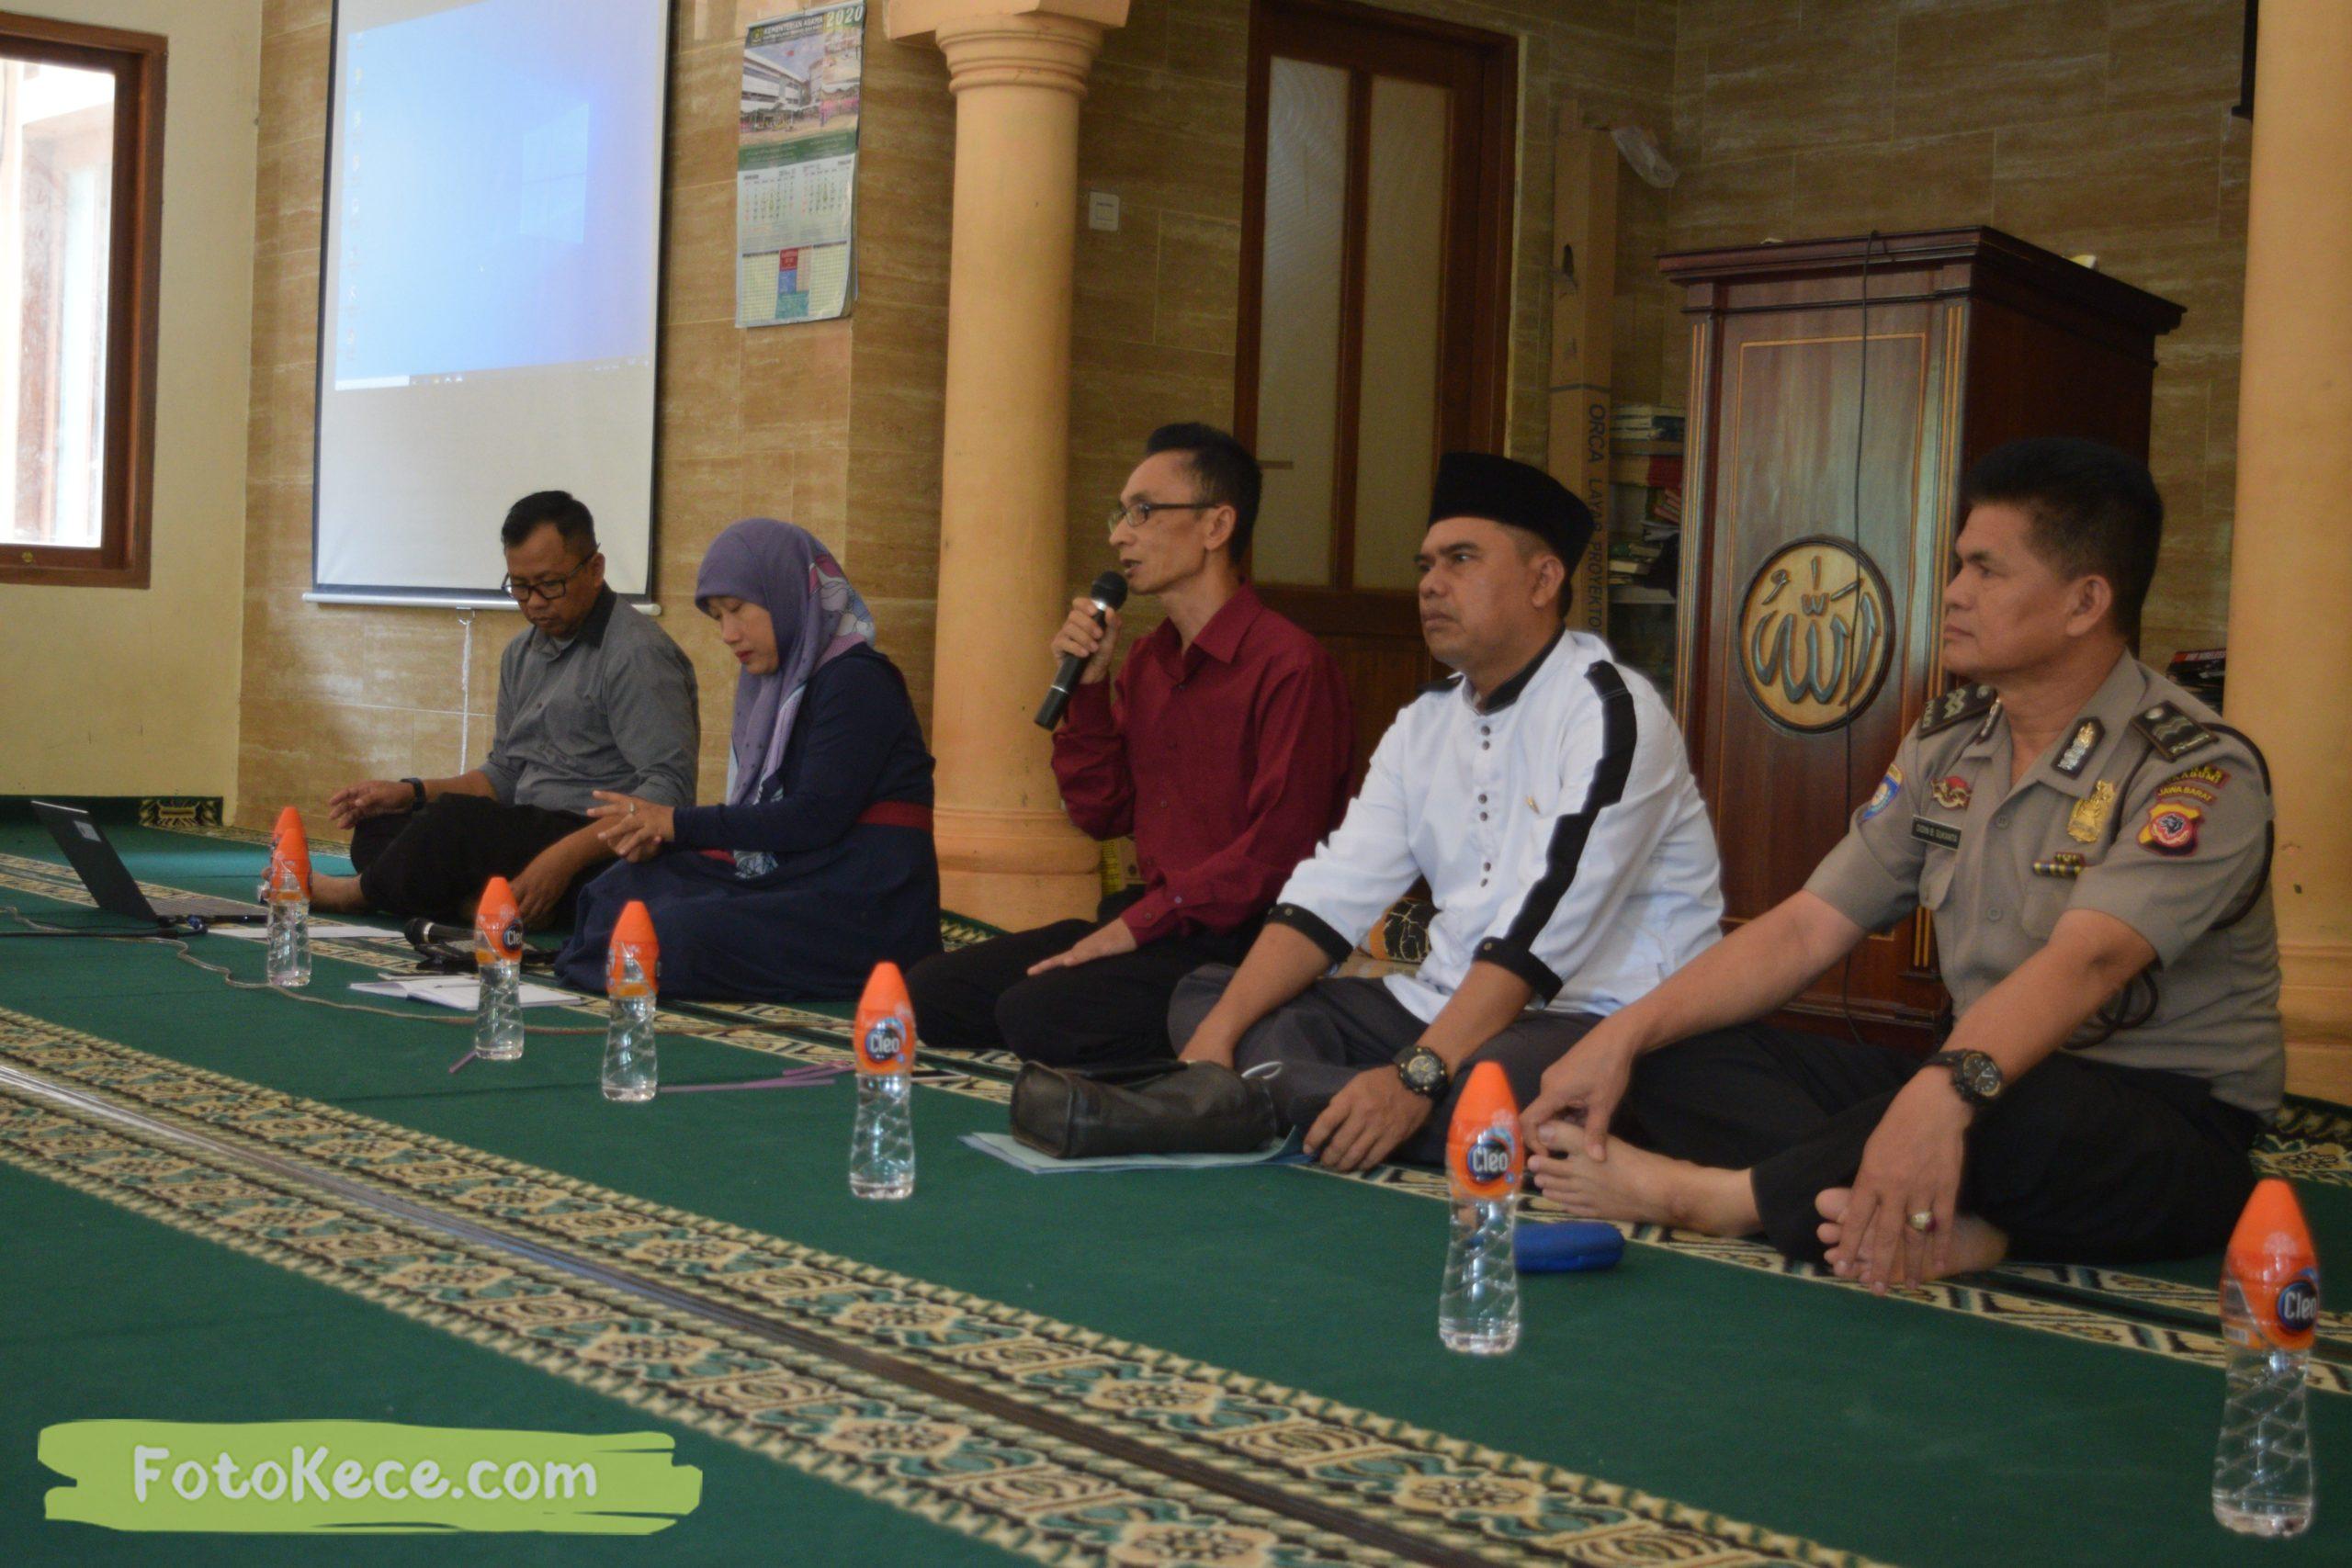 abdul aziz rapat komite ortu siswa kelas 9 mtsn 2 sukabumi 05022020 foto kece poto kece 51 scaled